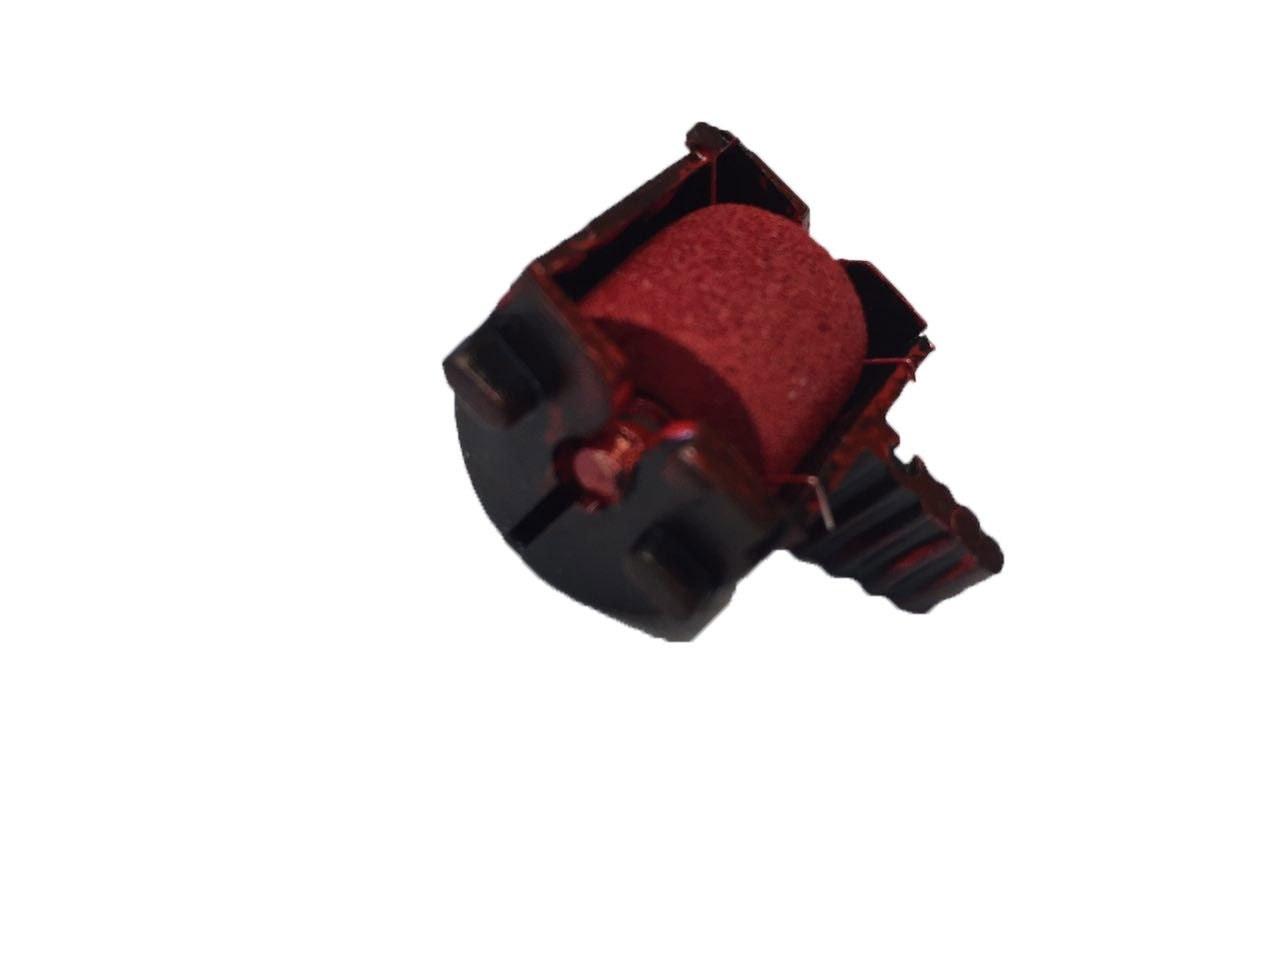 تصویر نمدی پرفراژ چک کاتیگا .مهر.پروتک.رمو.مگا.ax Catiga-Mehr CHECKWRITER Supply